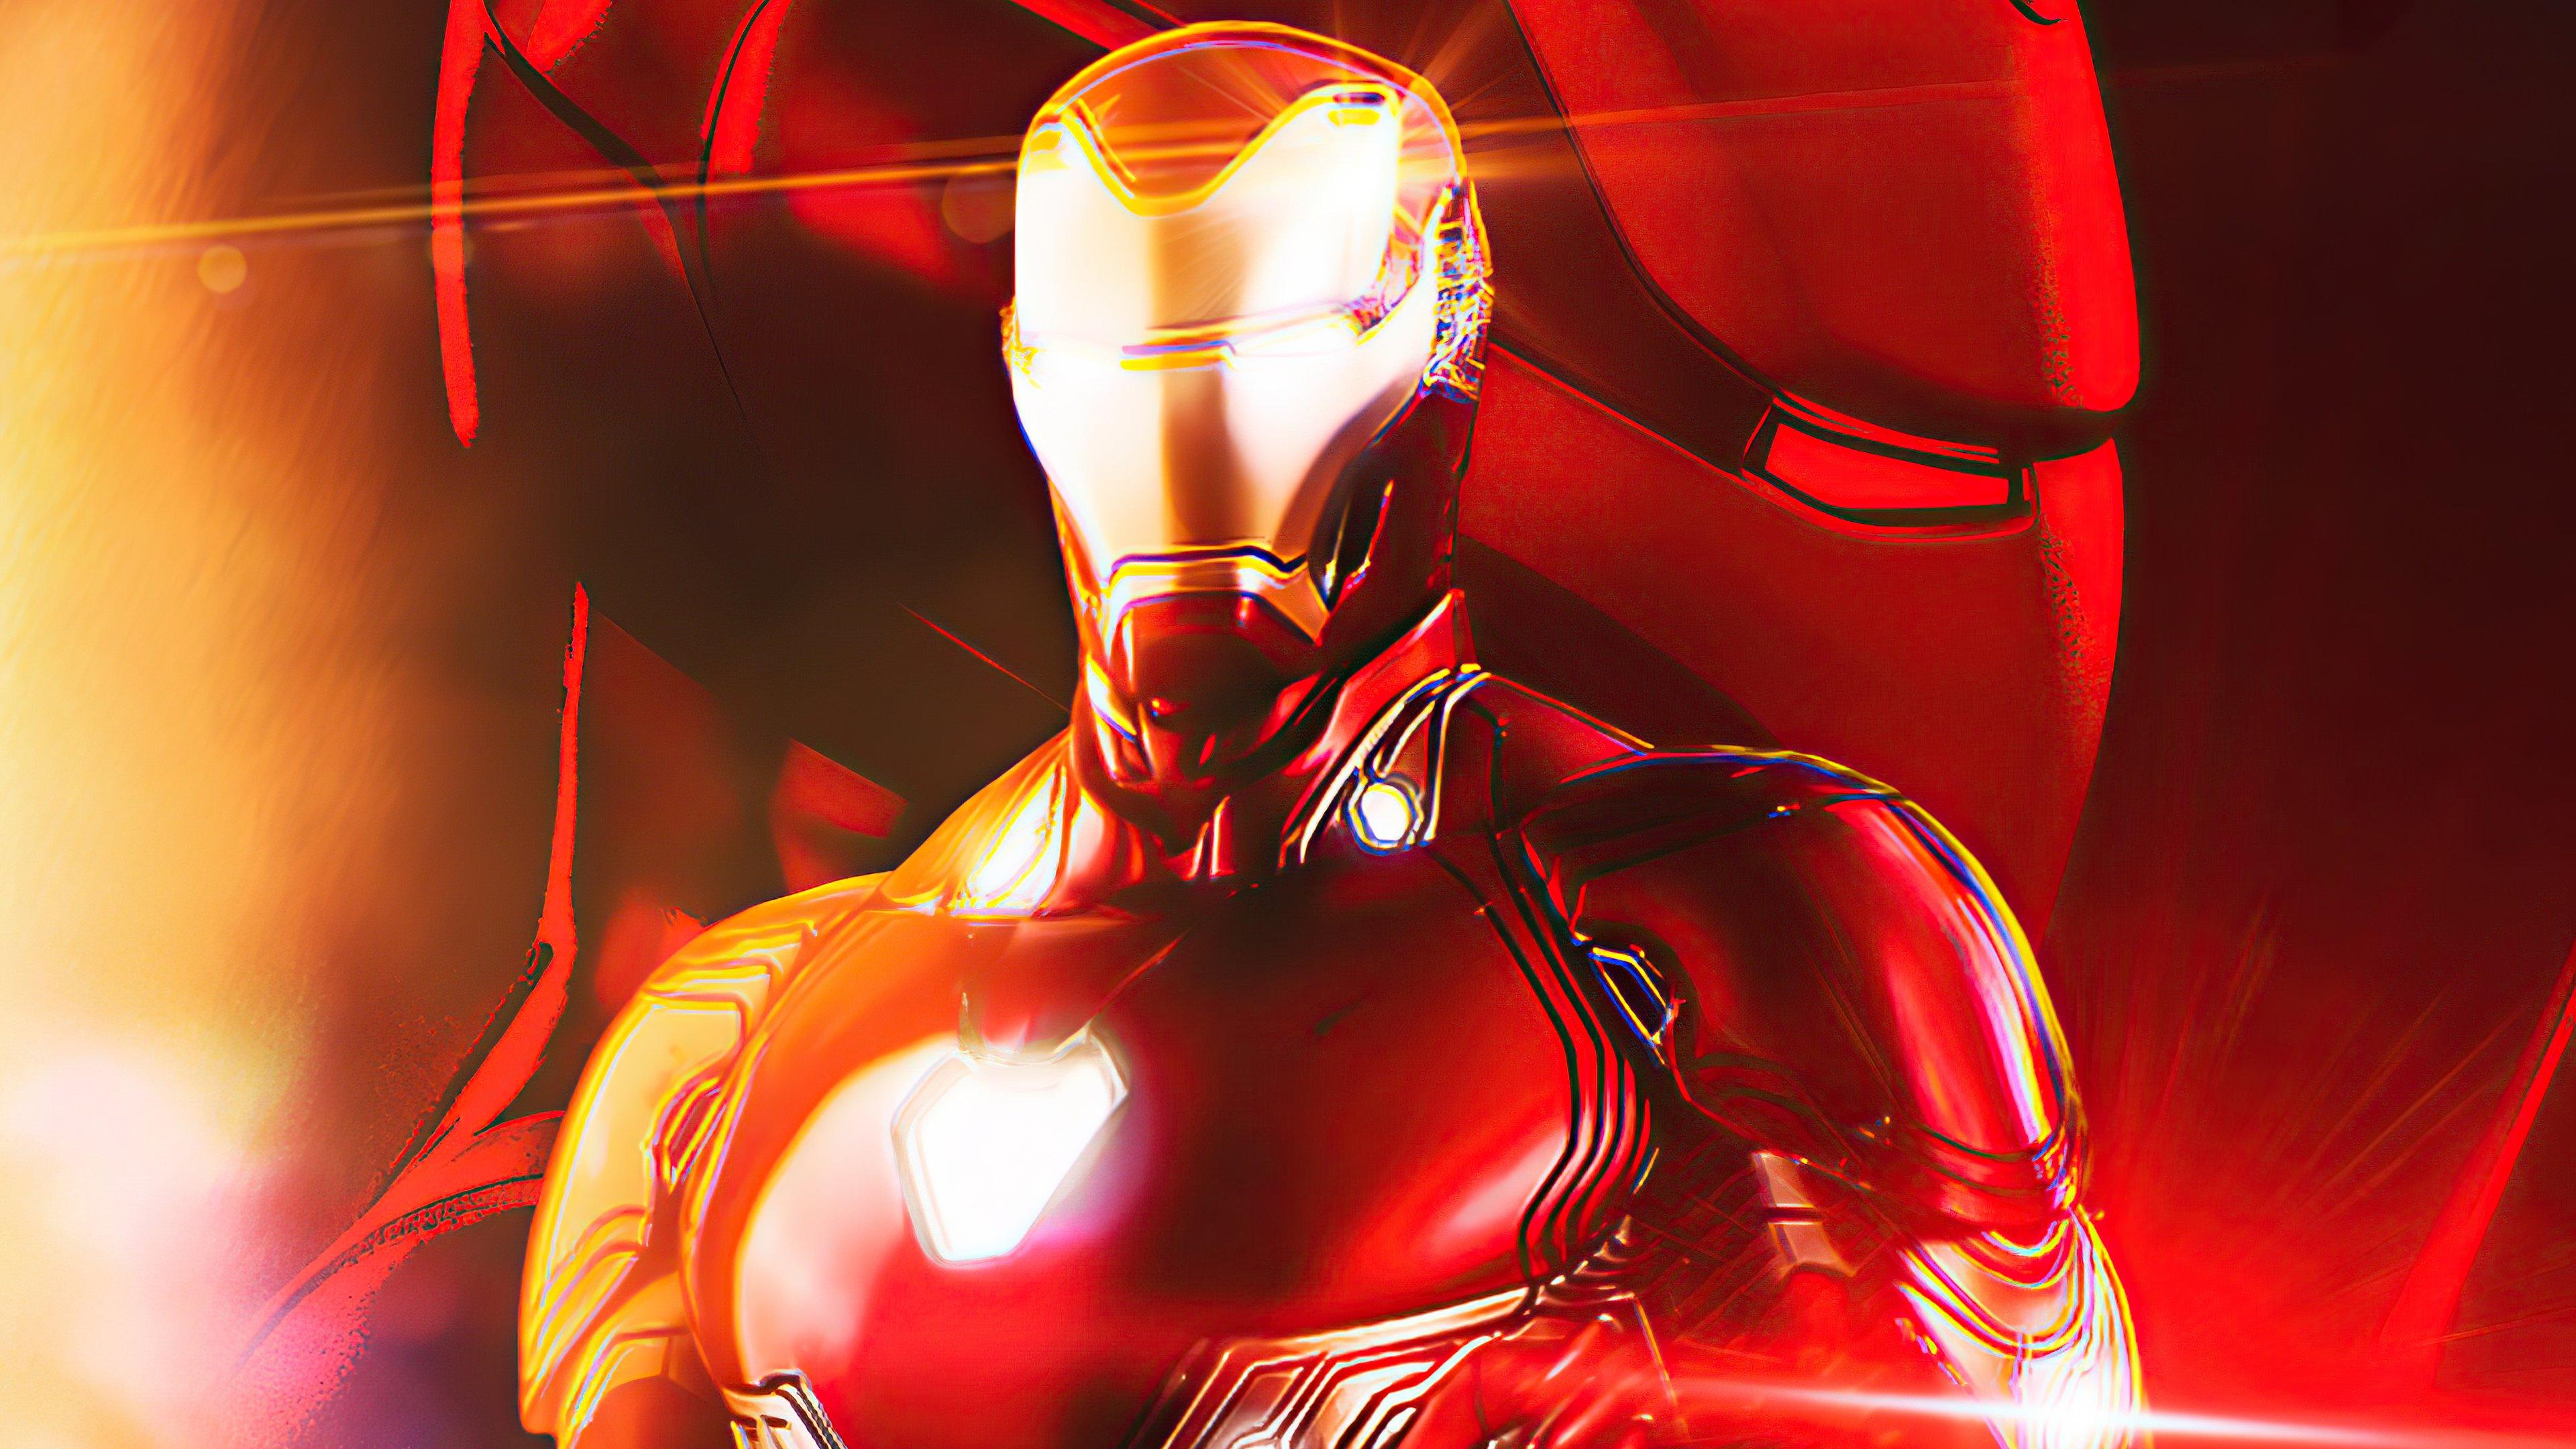 Wallpaper Iron Man Illustration